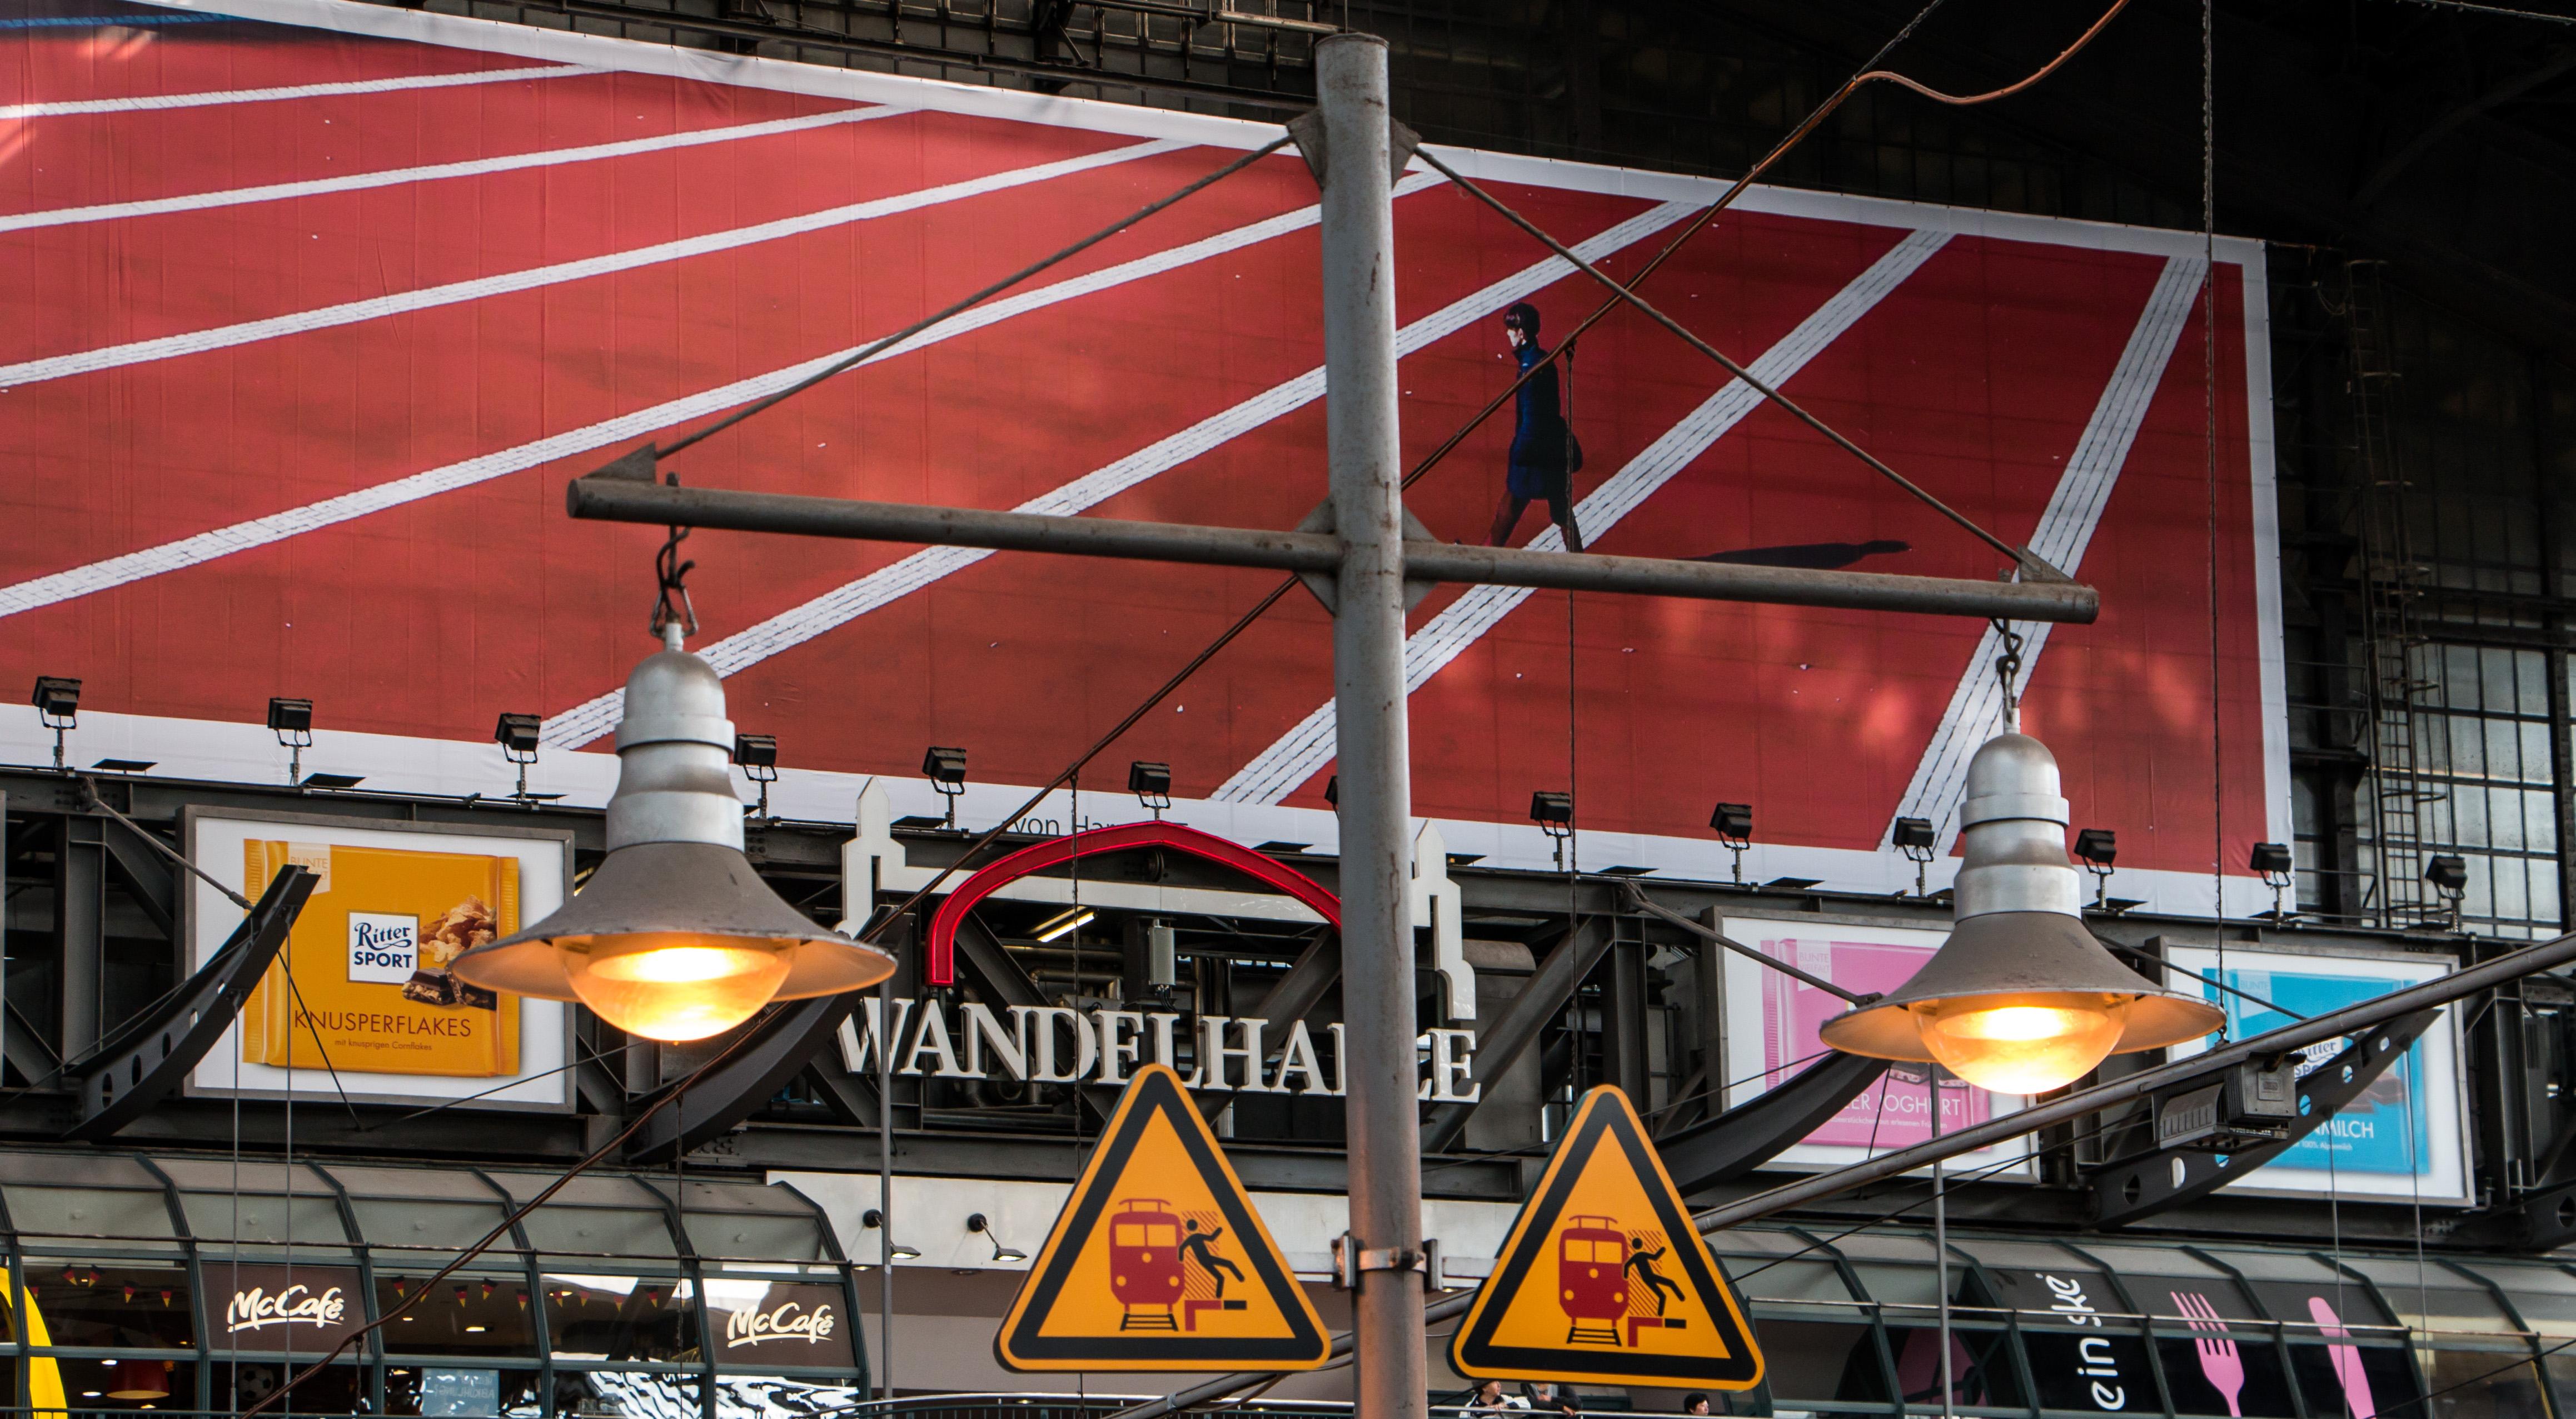 Train station art, Art, Artistic, Balancing, Hazard, HQ Photo